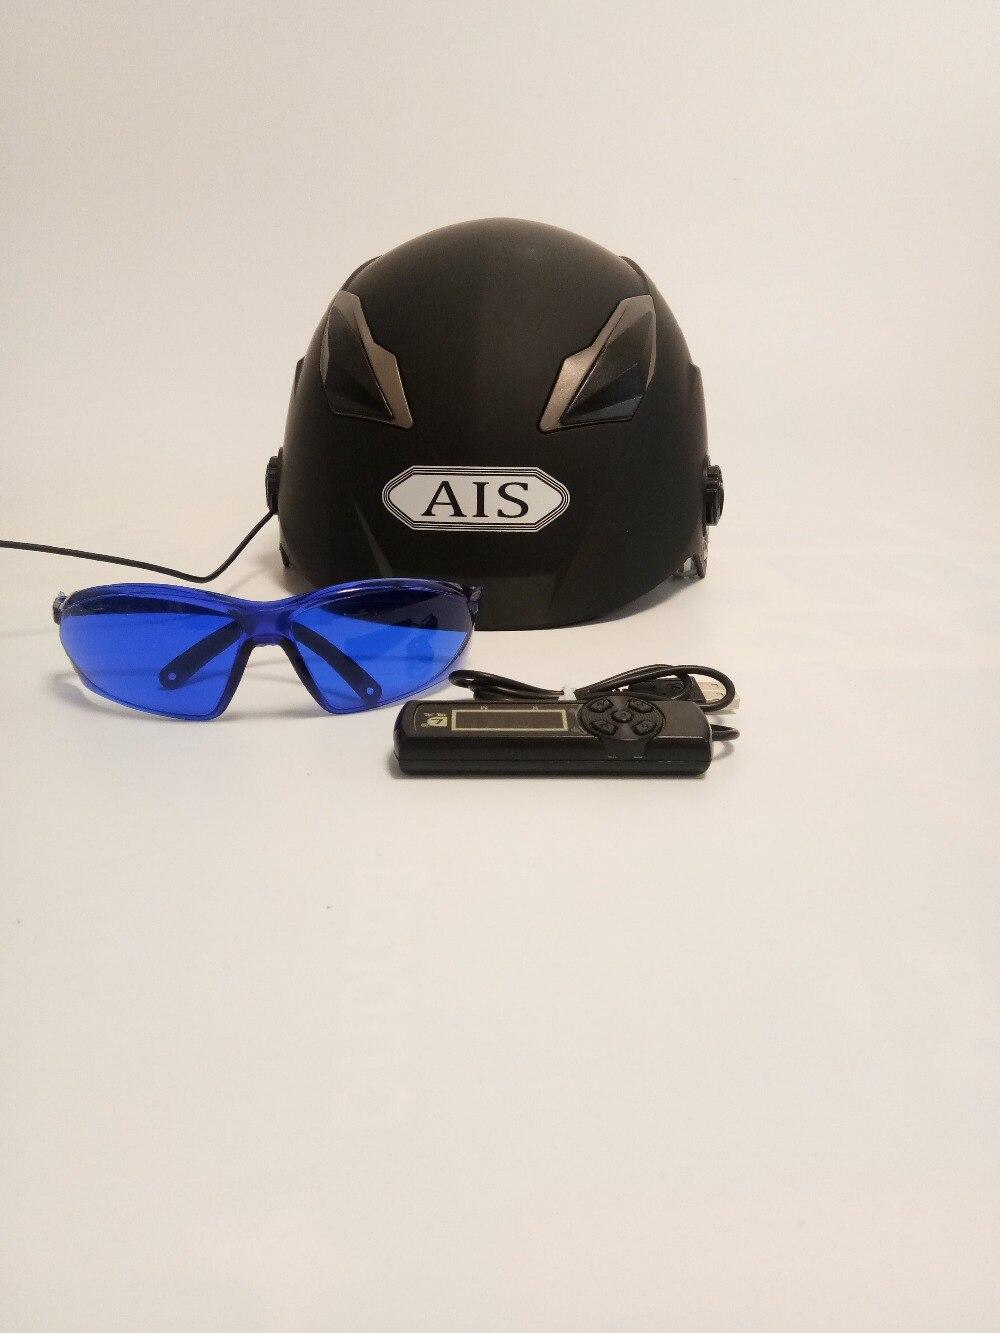 baldness hair grows system 650nm laser cap helmet for sale